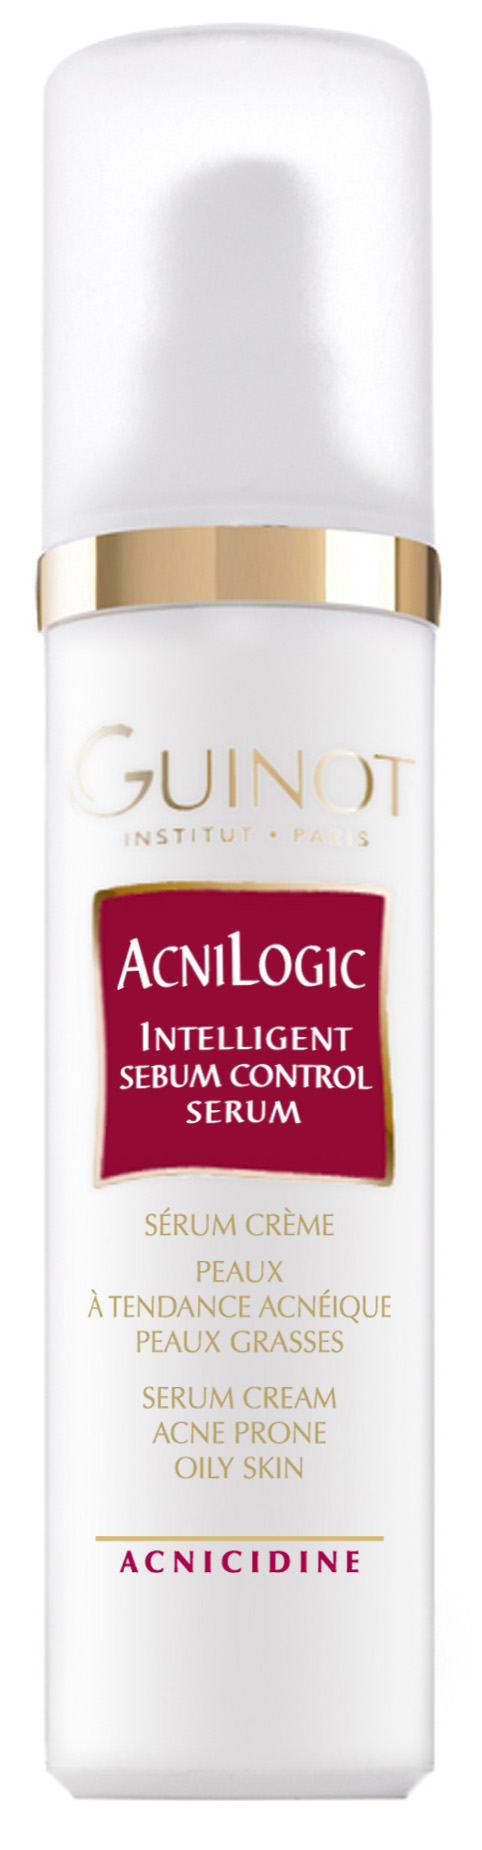 guinot acnilogic intelligent serum. Black Bedroom Furniture Sets. Home Design Ideas